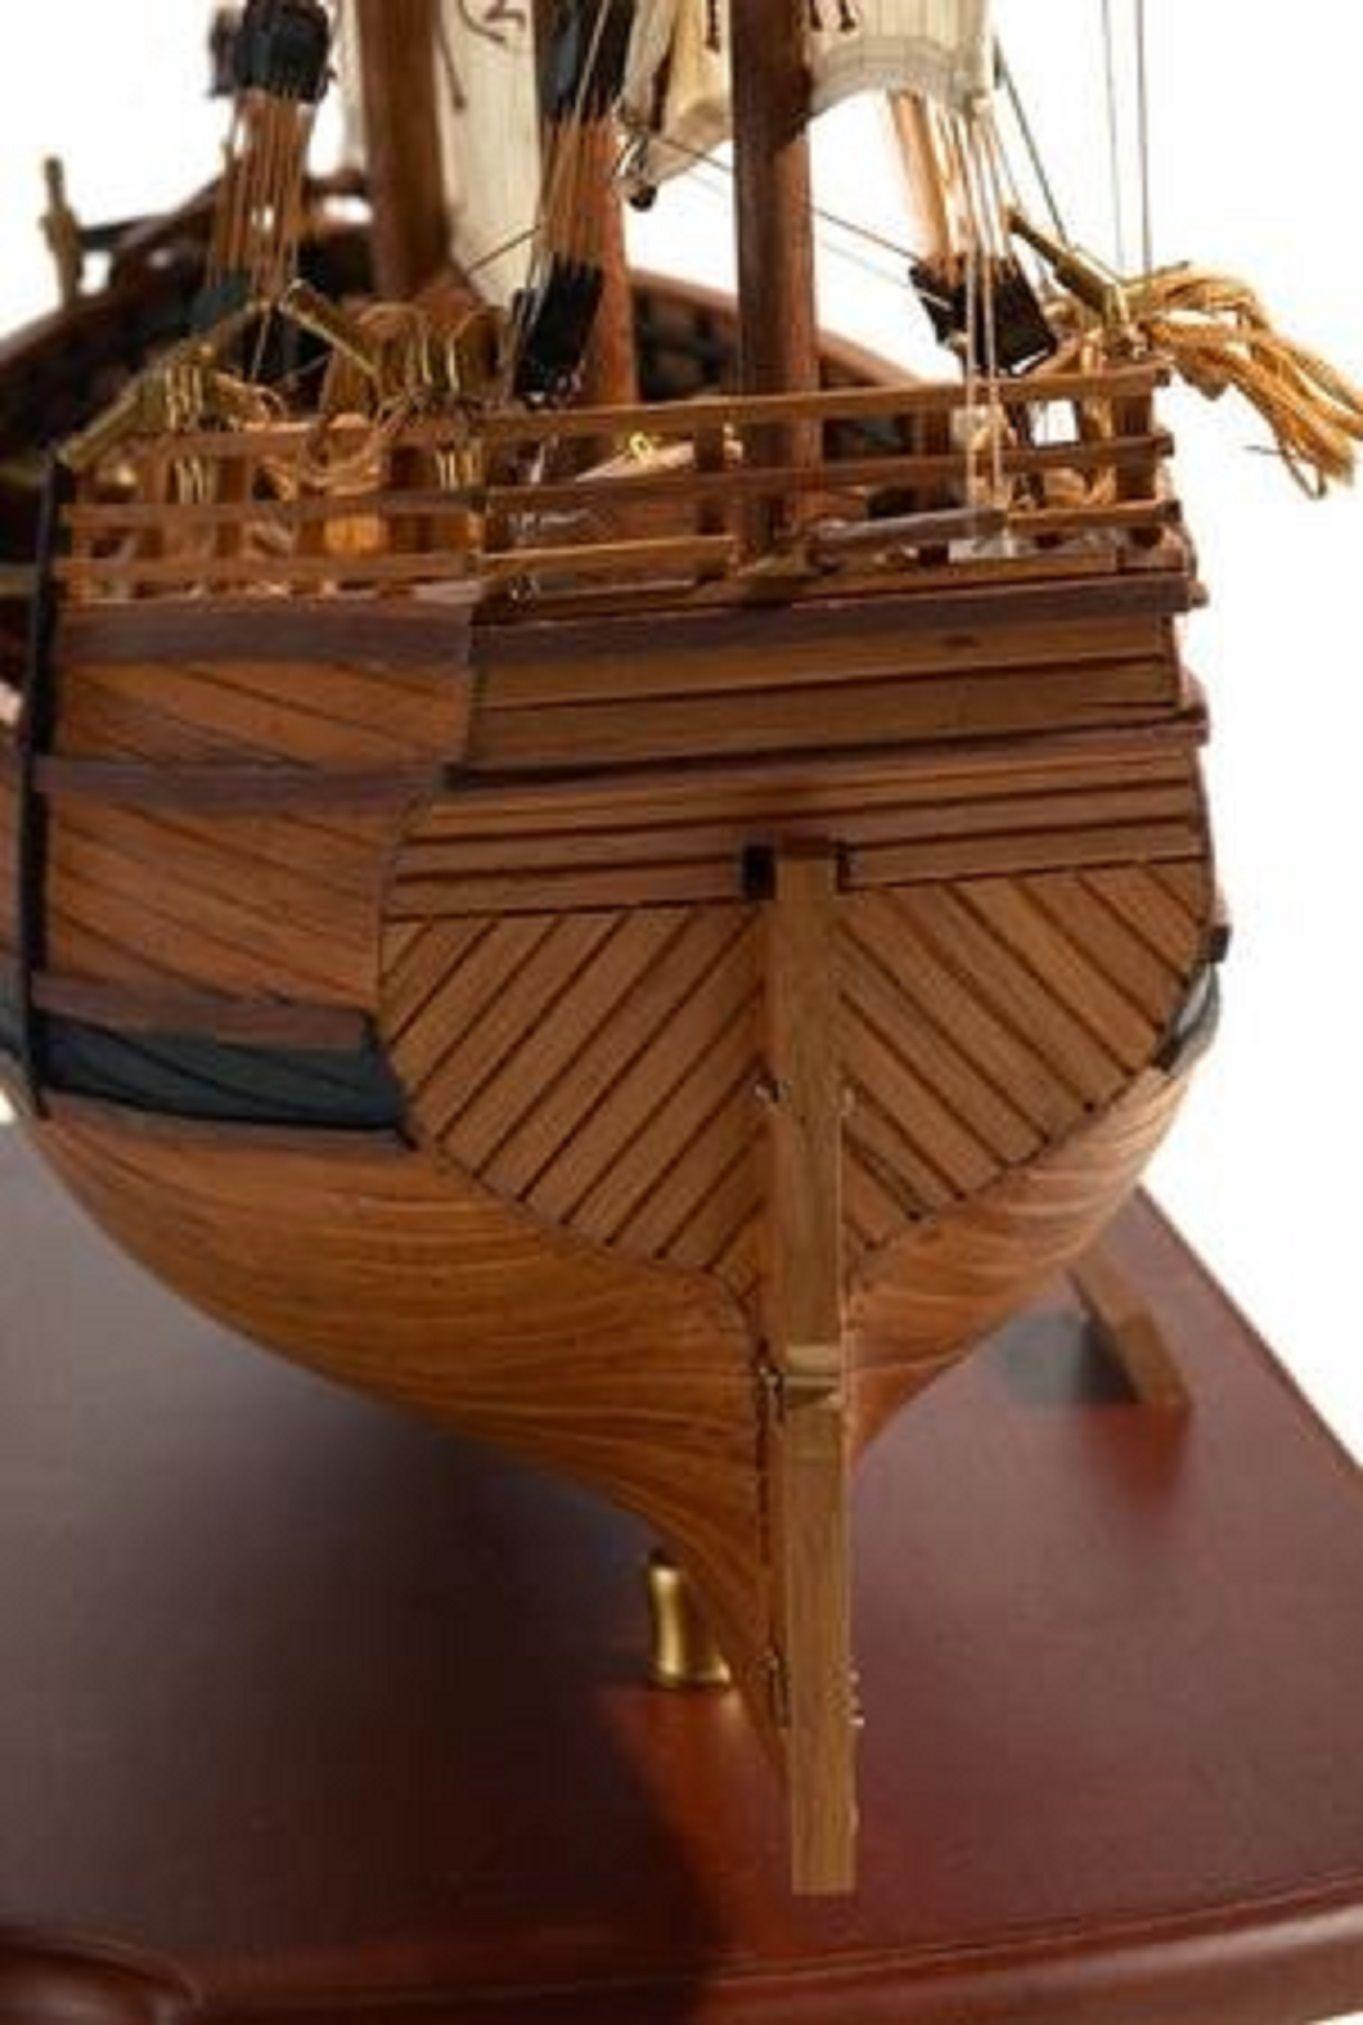 217-7199-Caravel-model-ship-Premier-Range